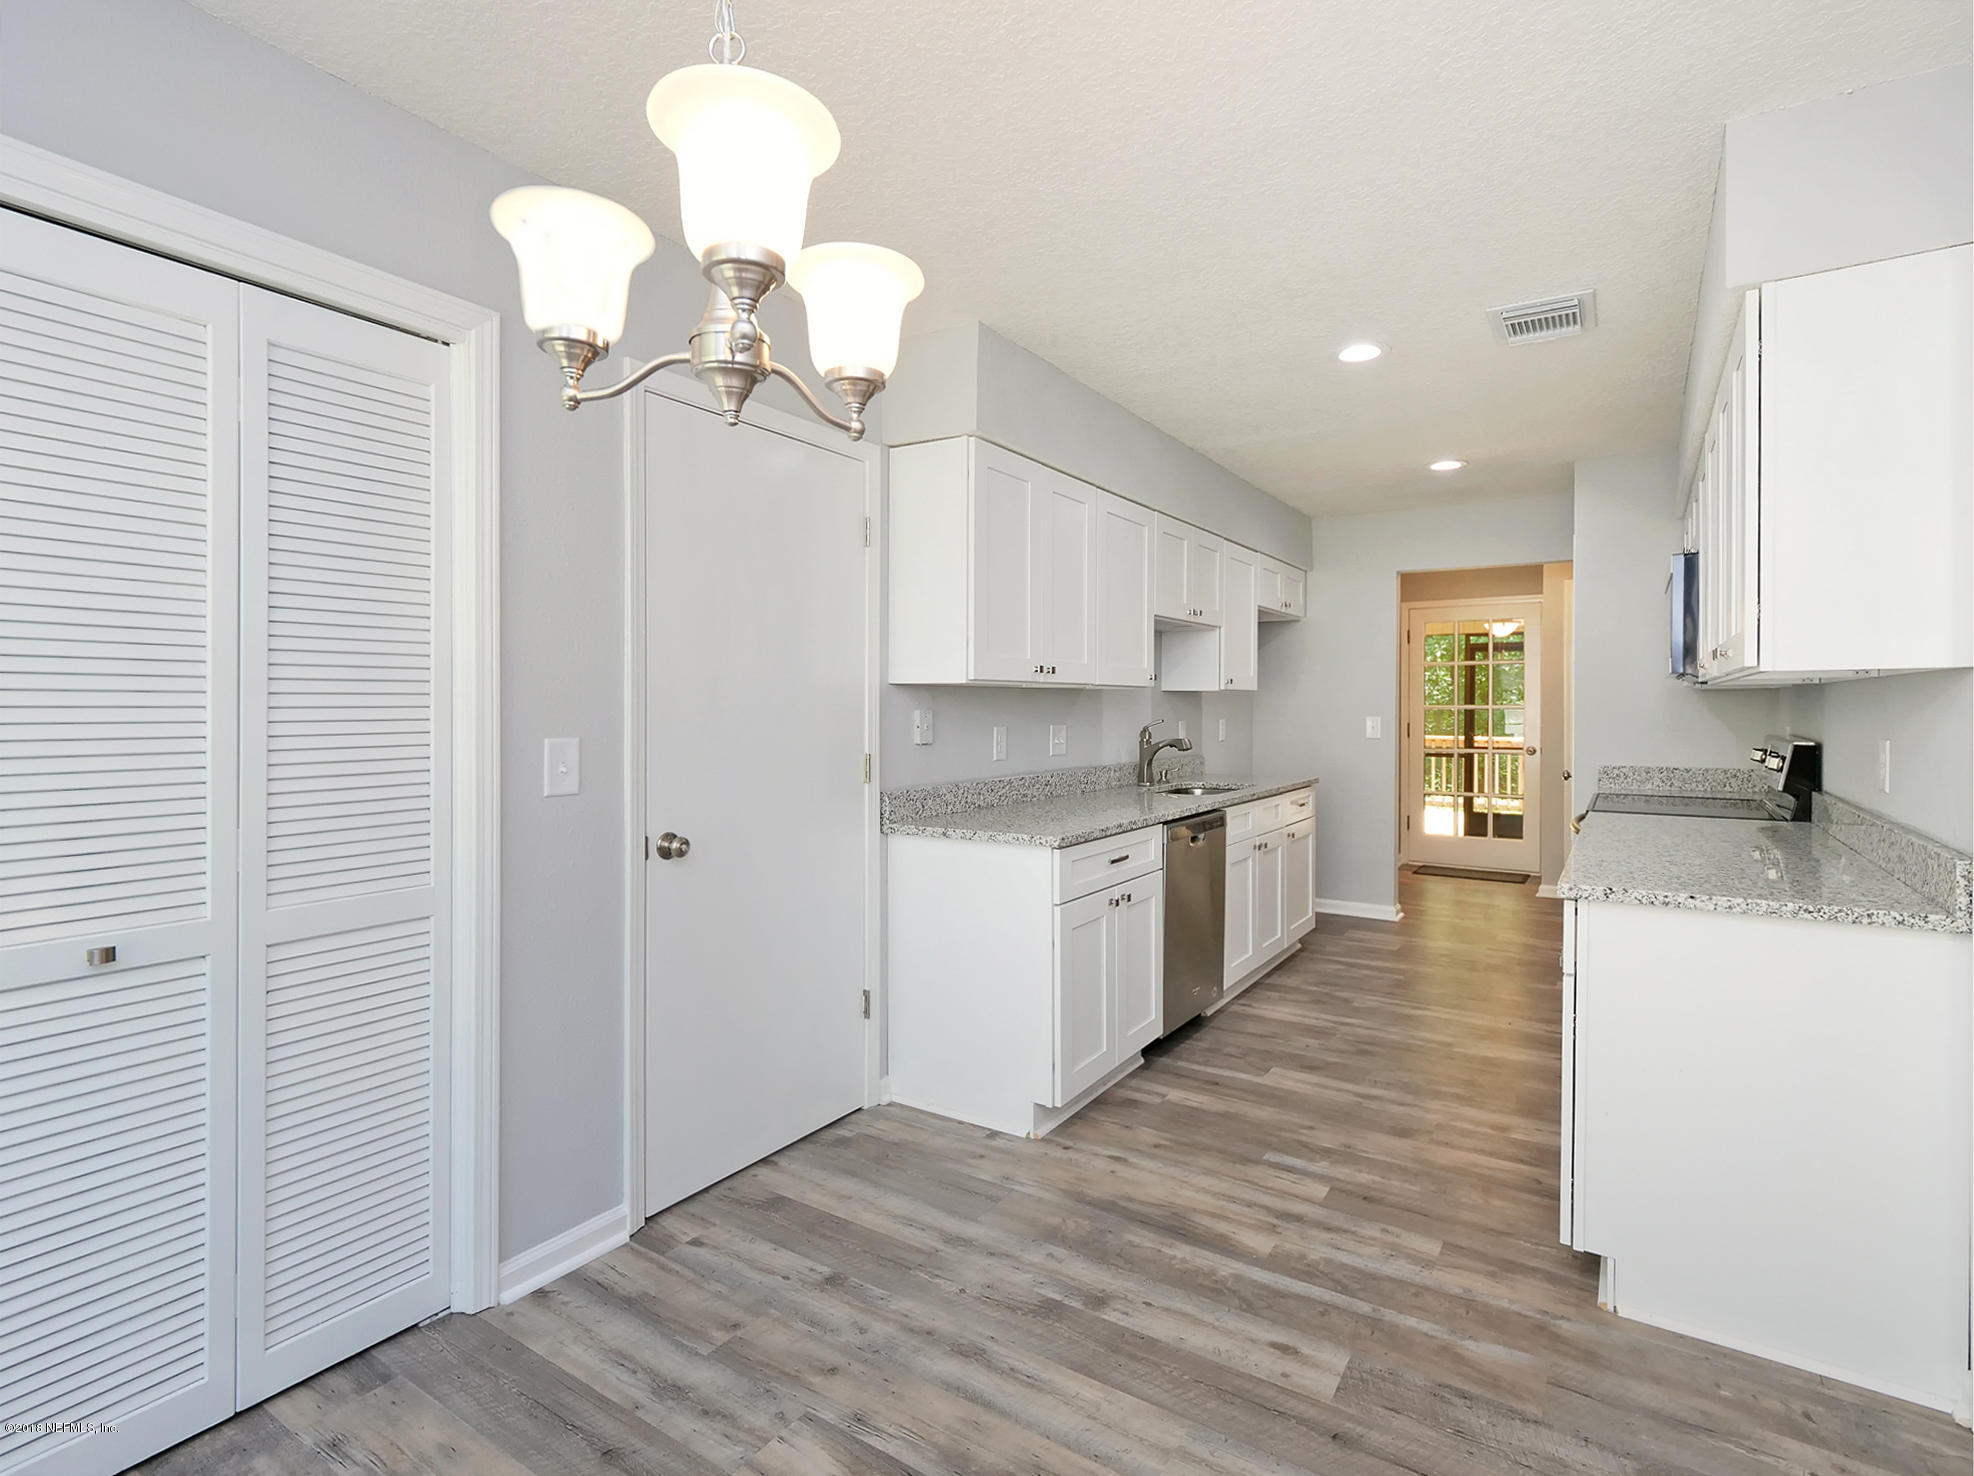 5154 JULINGTON CREEK, JACKSONVILLE, FLORIDA 32258, 3 Bedrooms Bedrooms, ,2 BathroomsBathrooms,Residential - single family,For sale,JULINGTON CREEK,937077